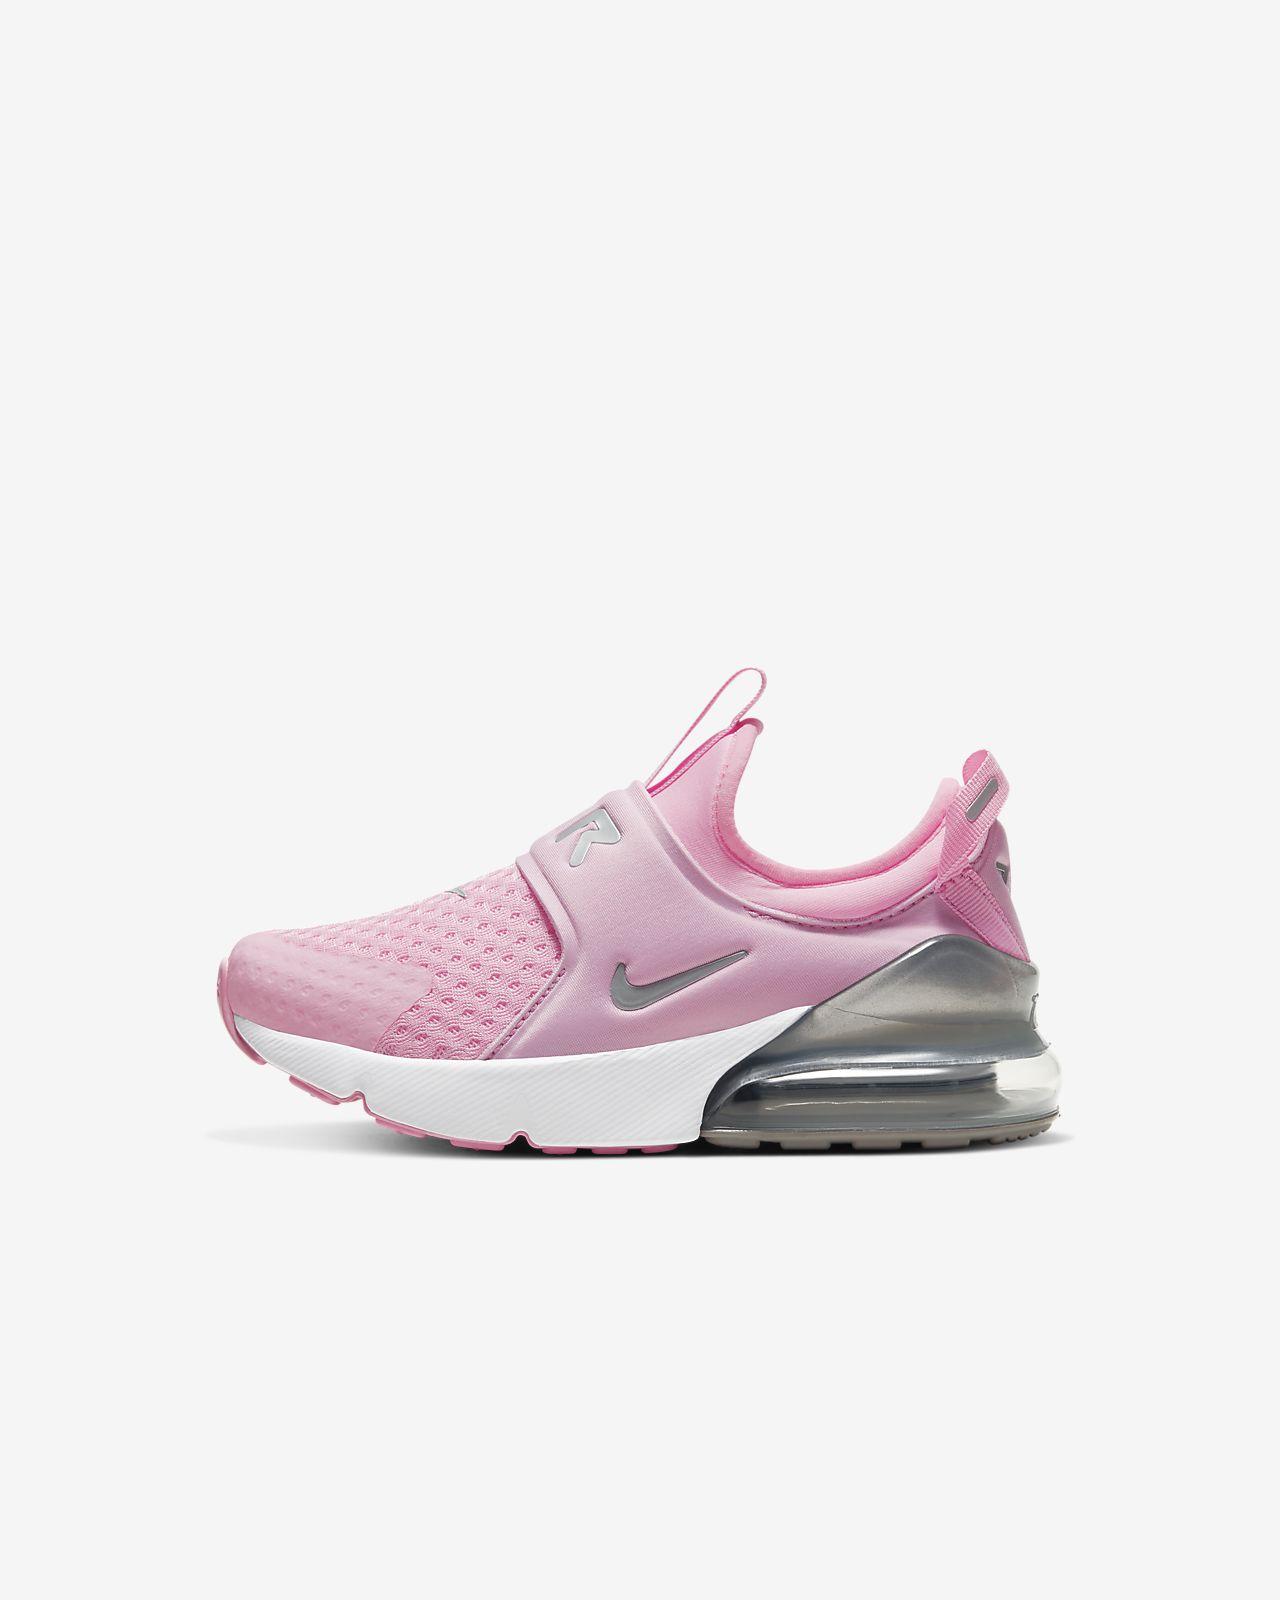 Nike Air Max 1 Sneakers Maat 38 Meisjes licht rozewit